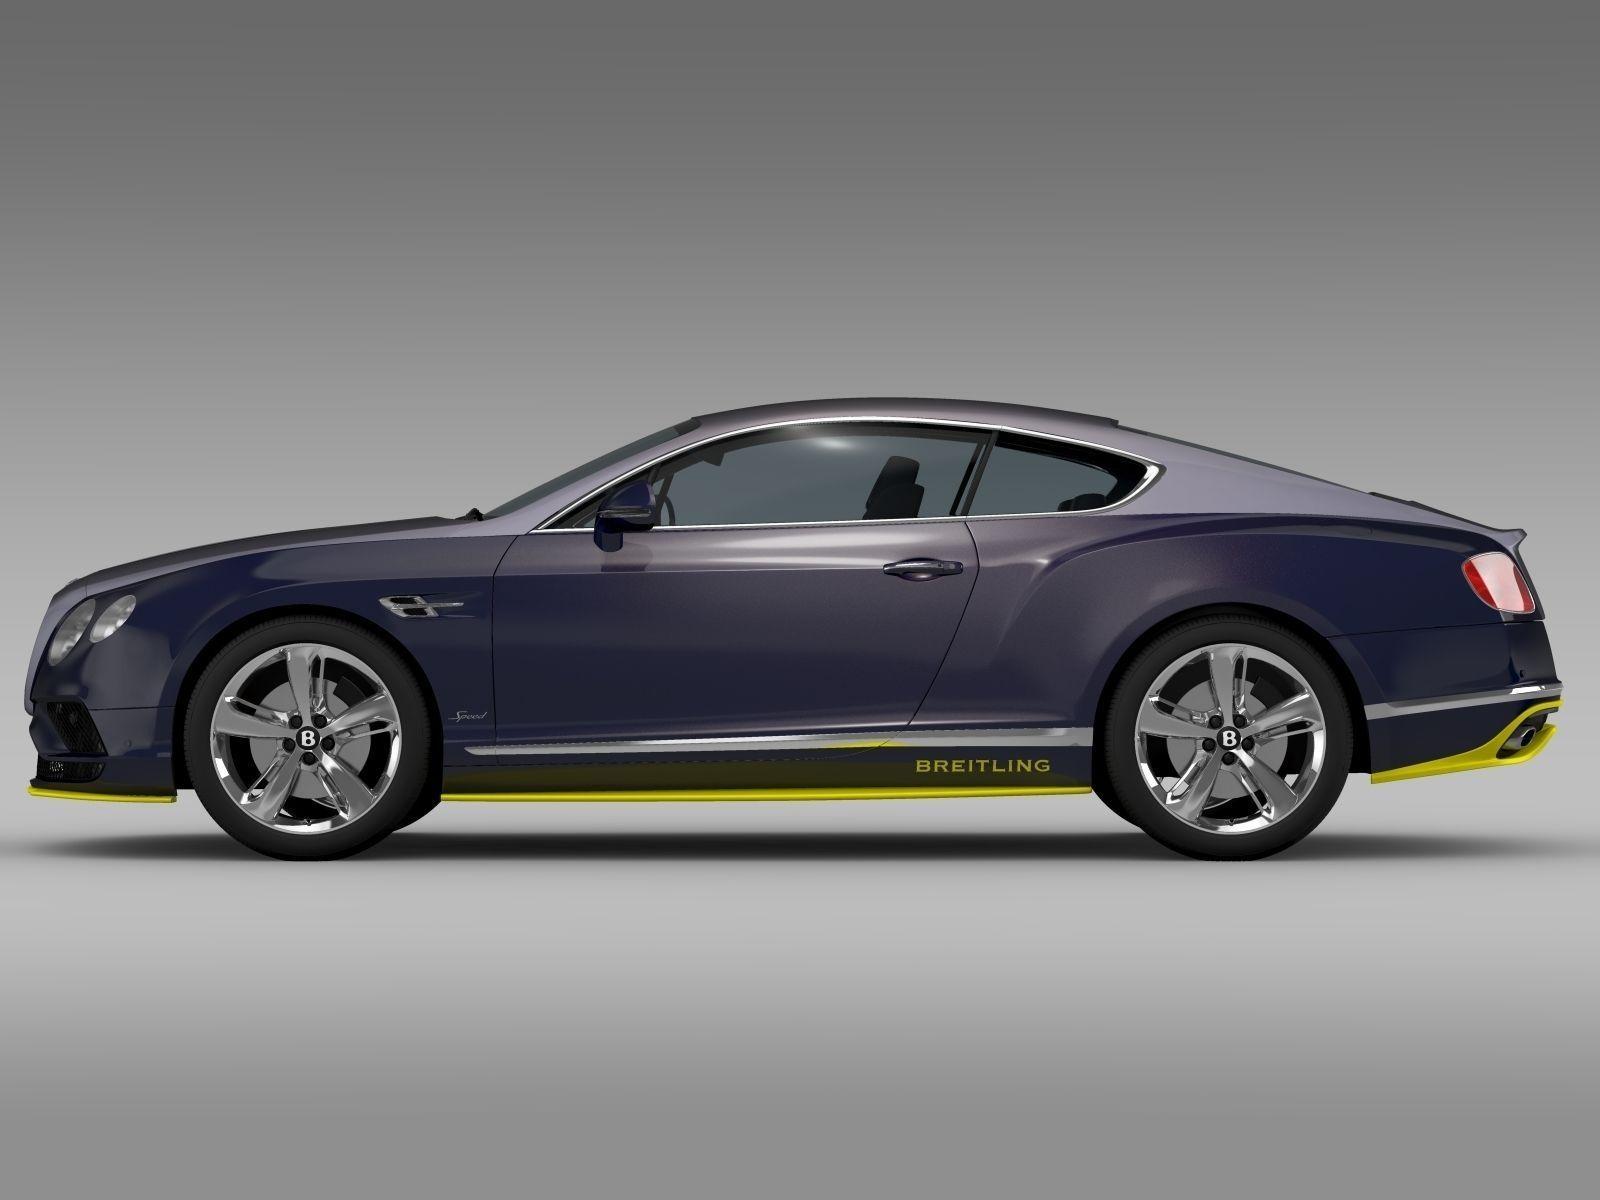 Bentley Continental GT Speed Breitling Jet Team Series 2016 3D model ...